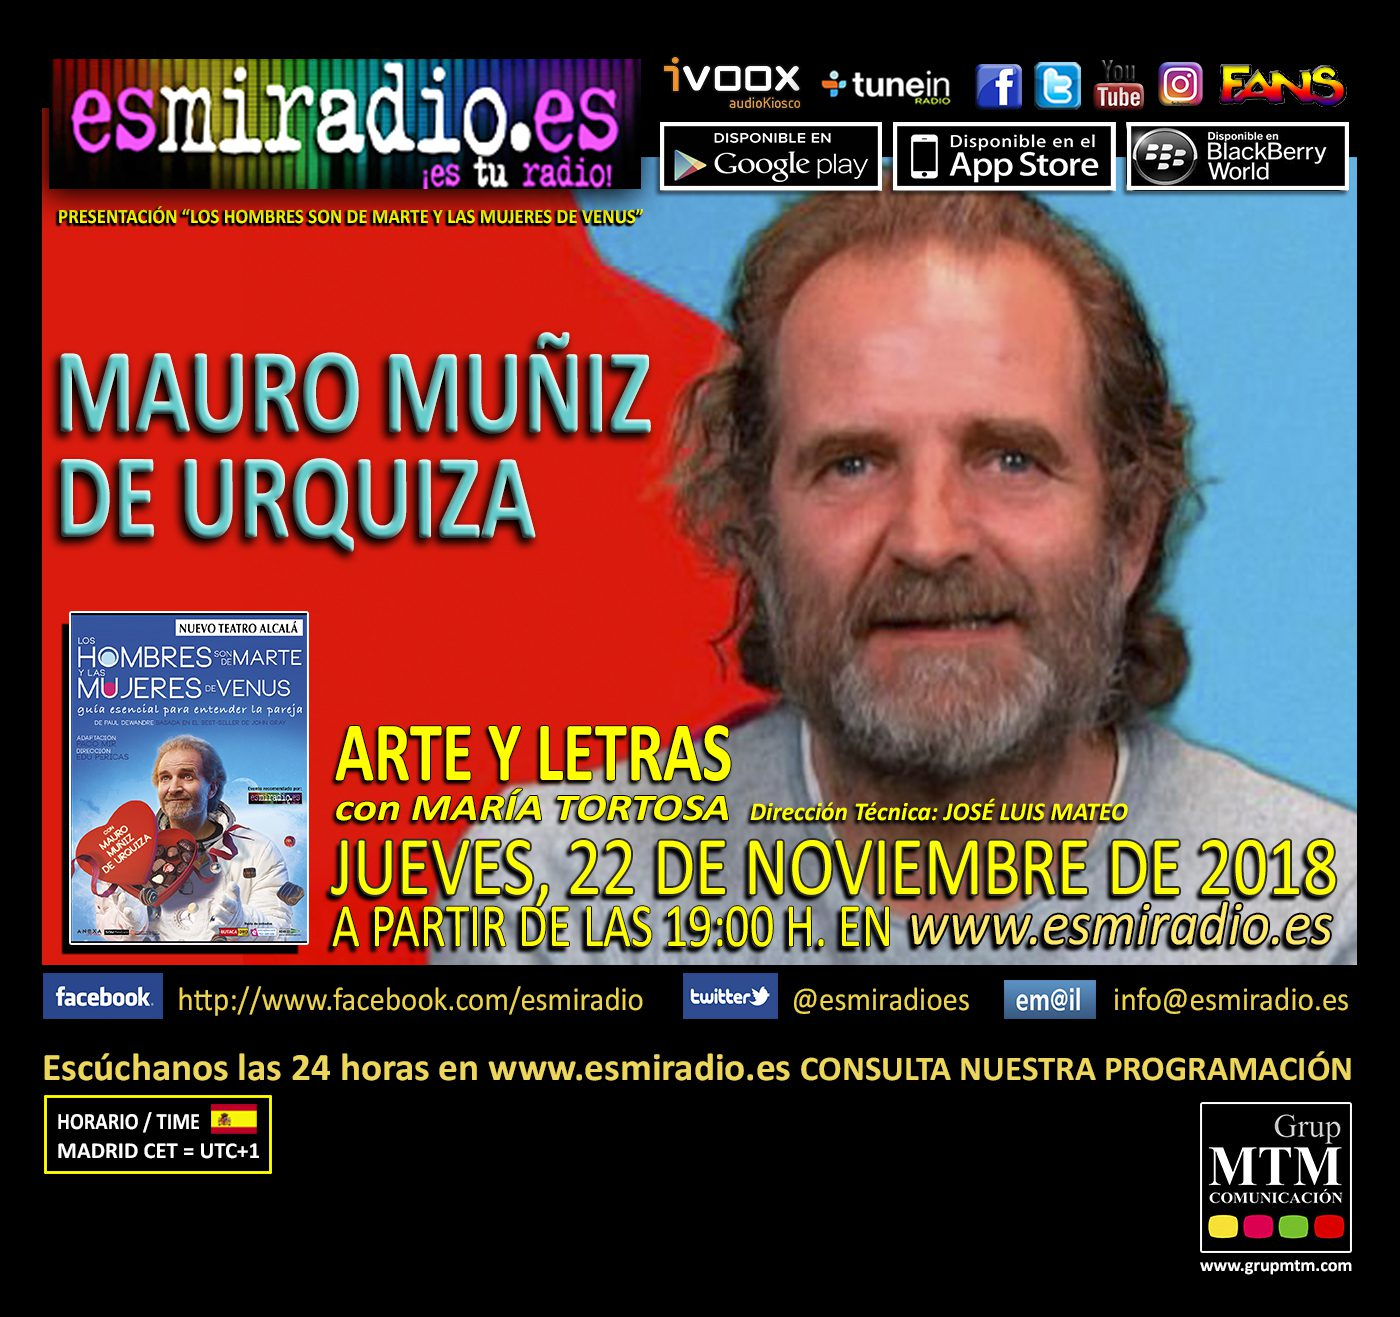 Mauro Muñiz de Urquiza 221118 - esmiradio